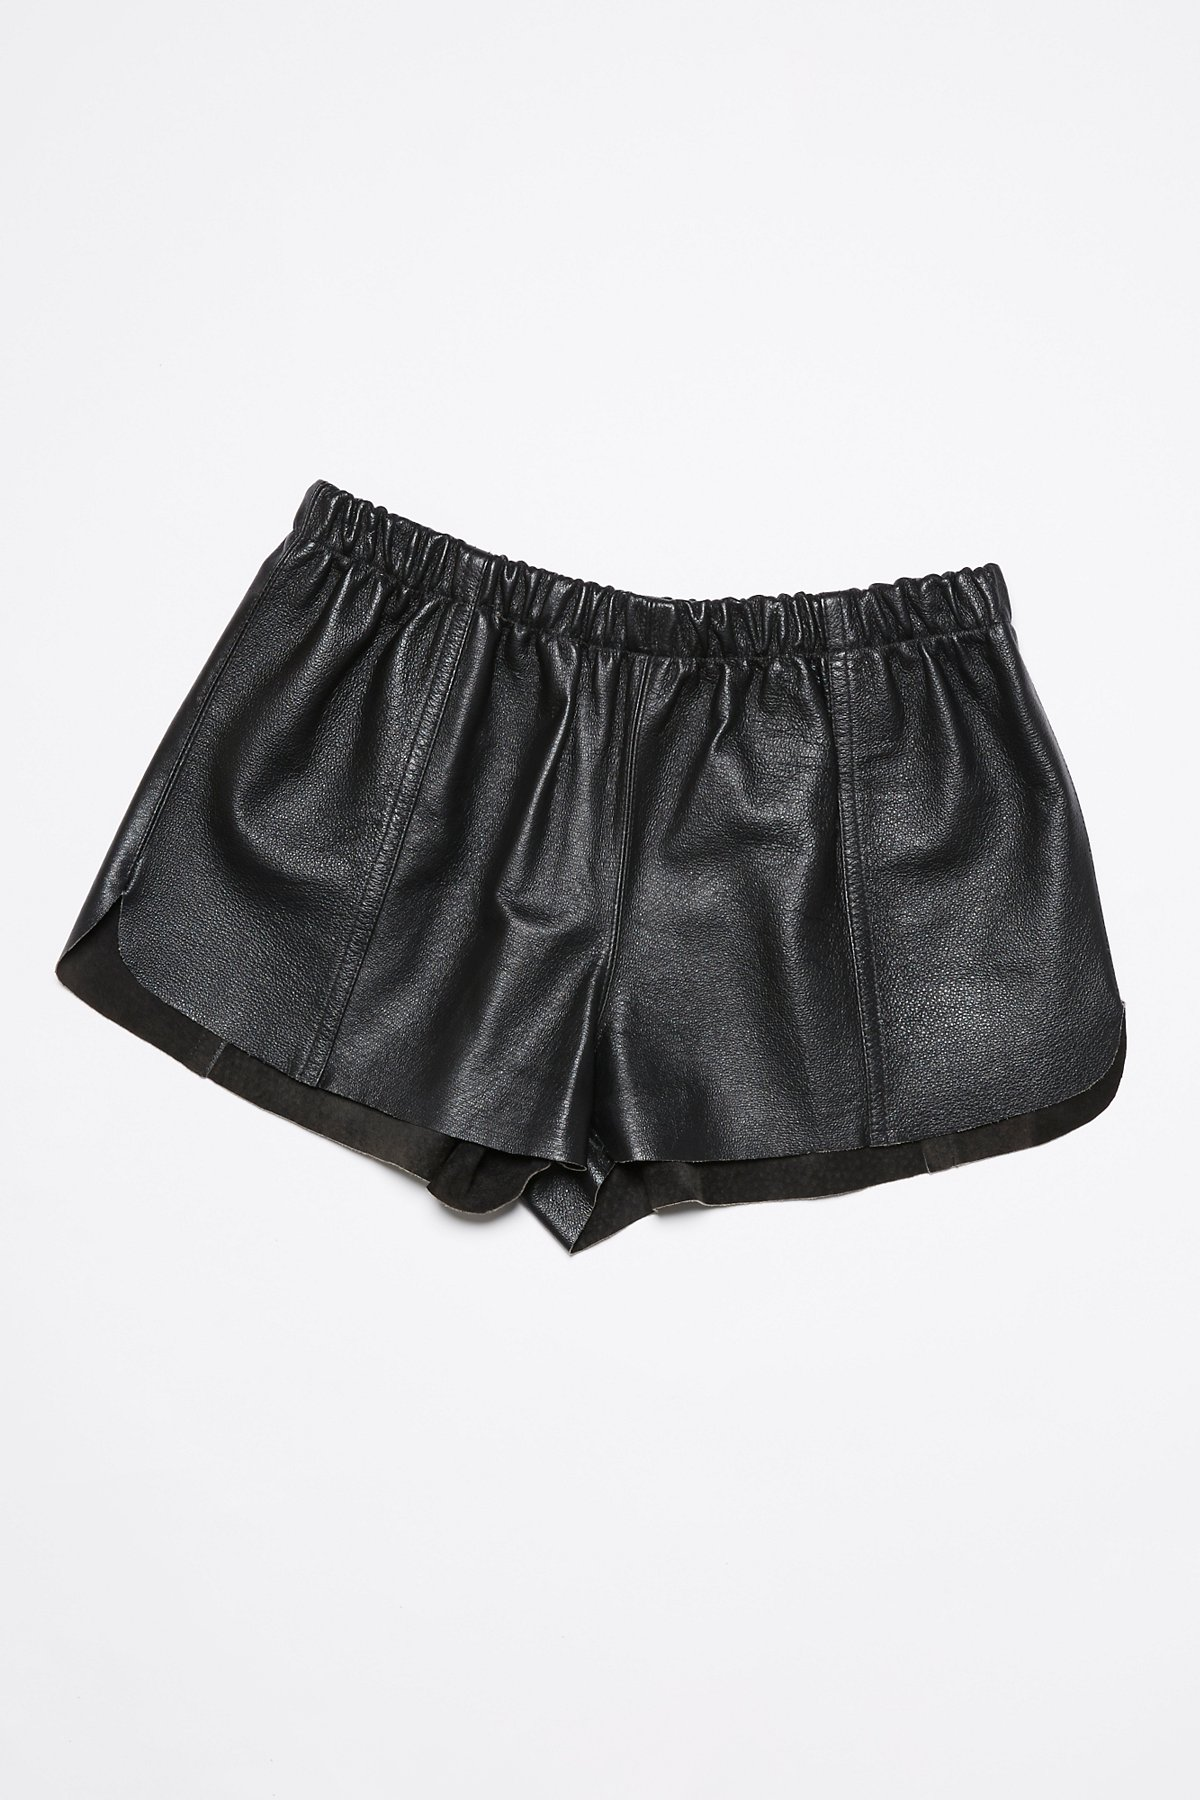 Vintage 1980s Leather Shorts